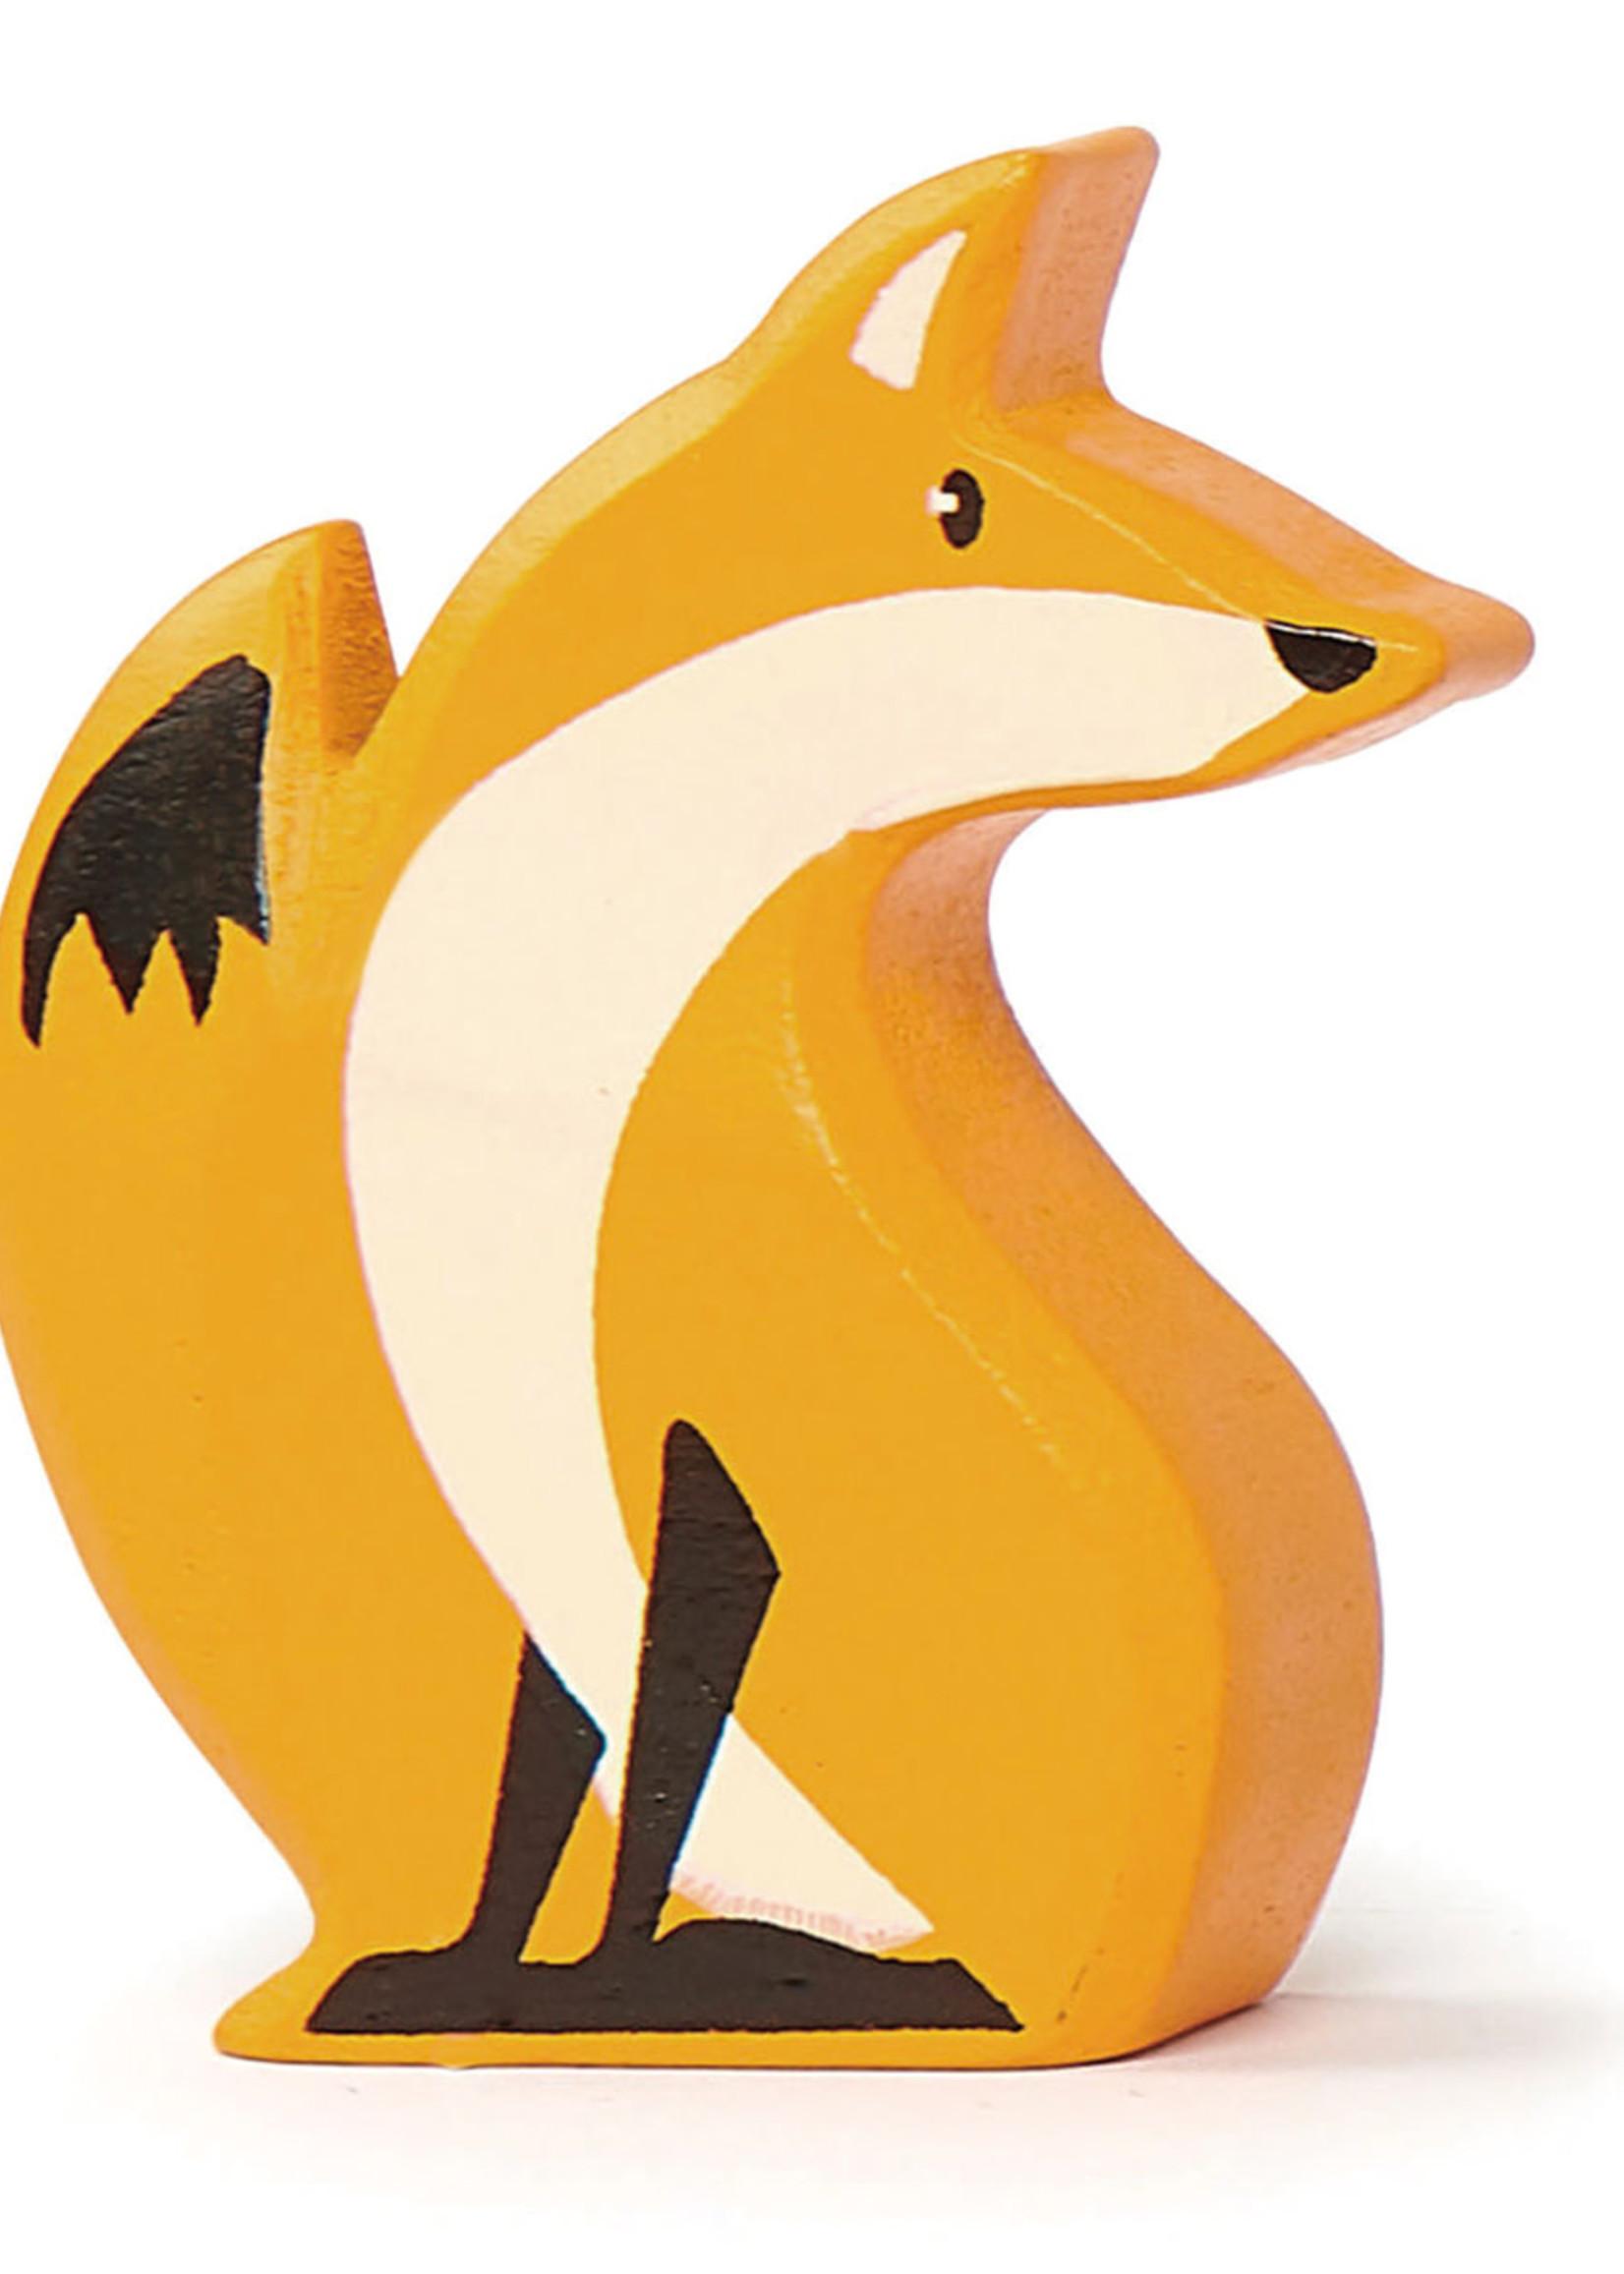 Tender Leaf Toys Woodland Animal Fox